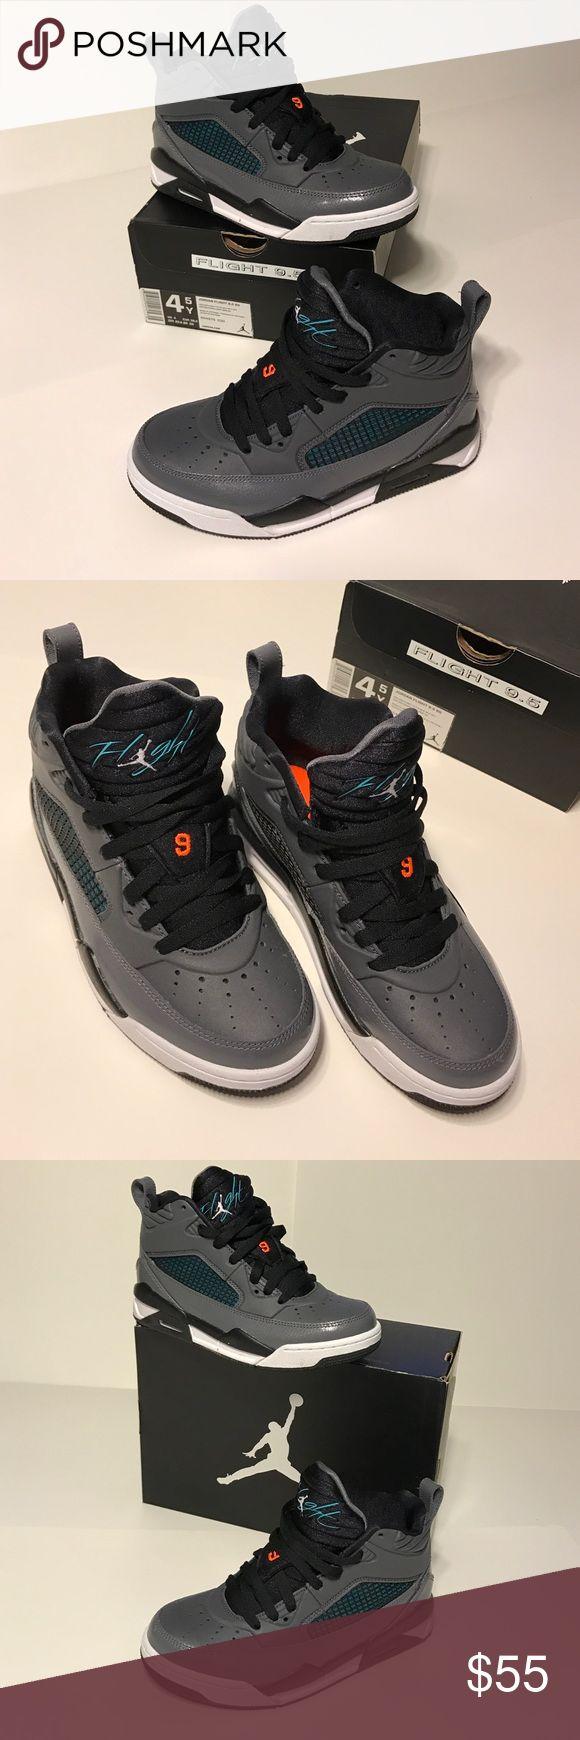 Jordan Flight 9.5 GS 4.5Y Jordan Flight 9.5 Grade School Size 4.5Y also fits WMNS 6 comes in original box Jordan Shoes Sneakers